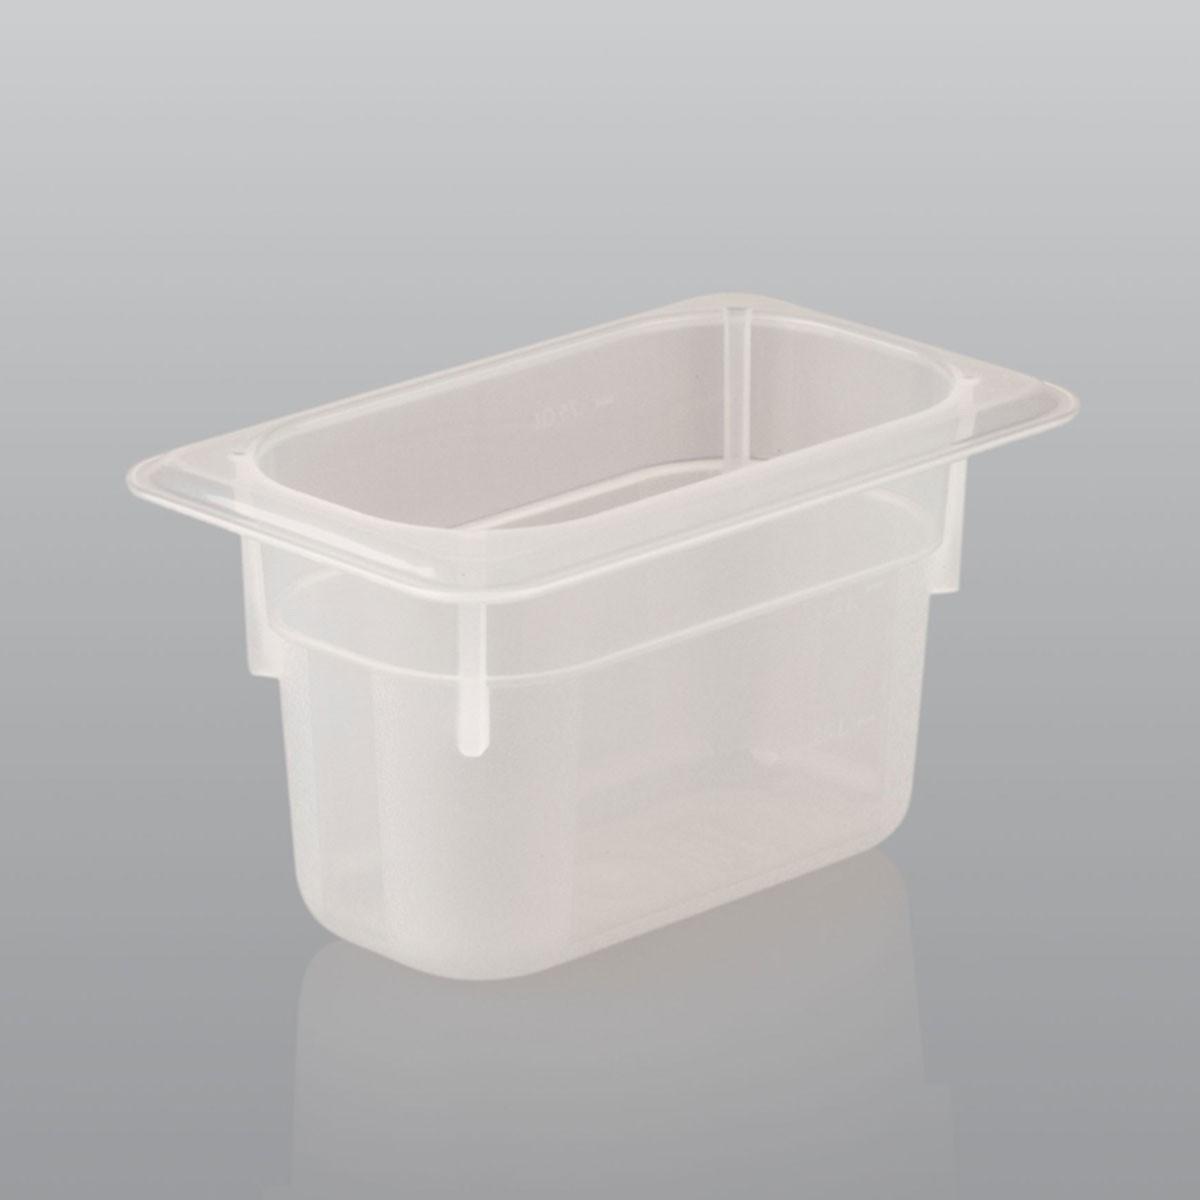 GN Behälter GN 1/9 aus Polypropylen (Tiefe: 65mm) 0,6 L Saro